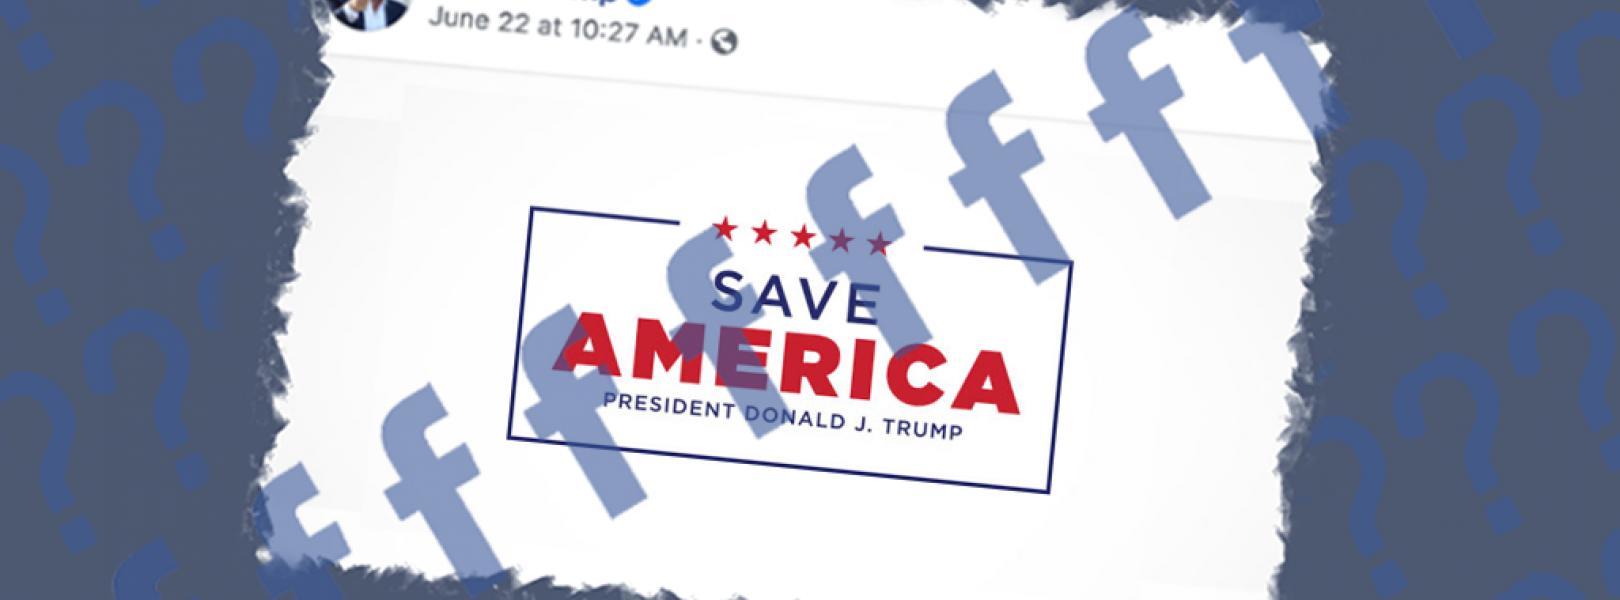 Facebook Trump fundraise